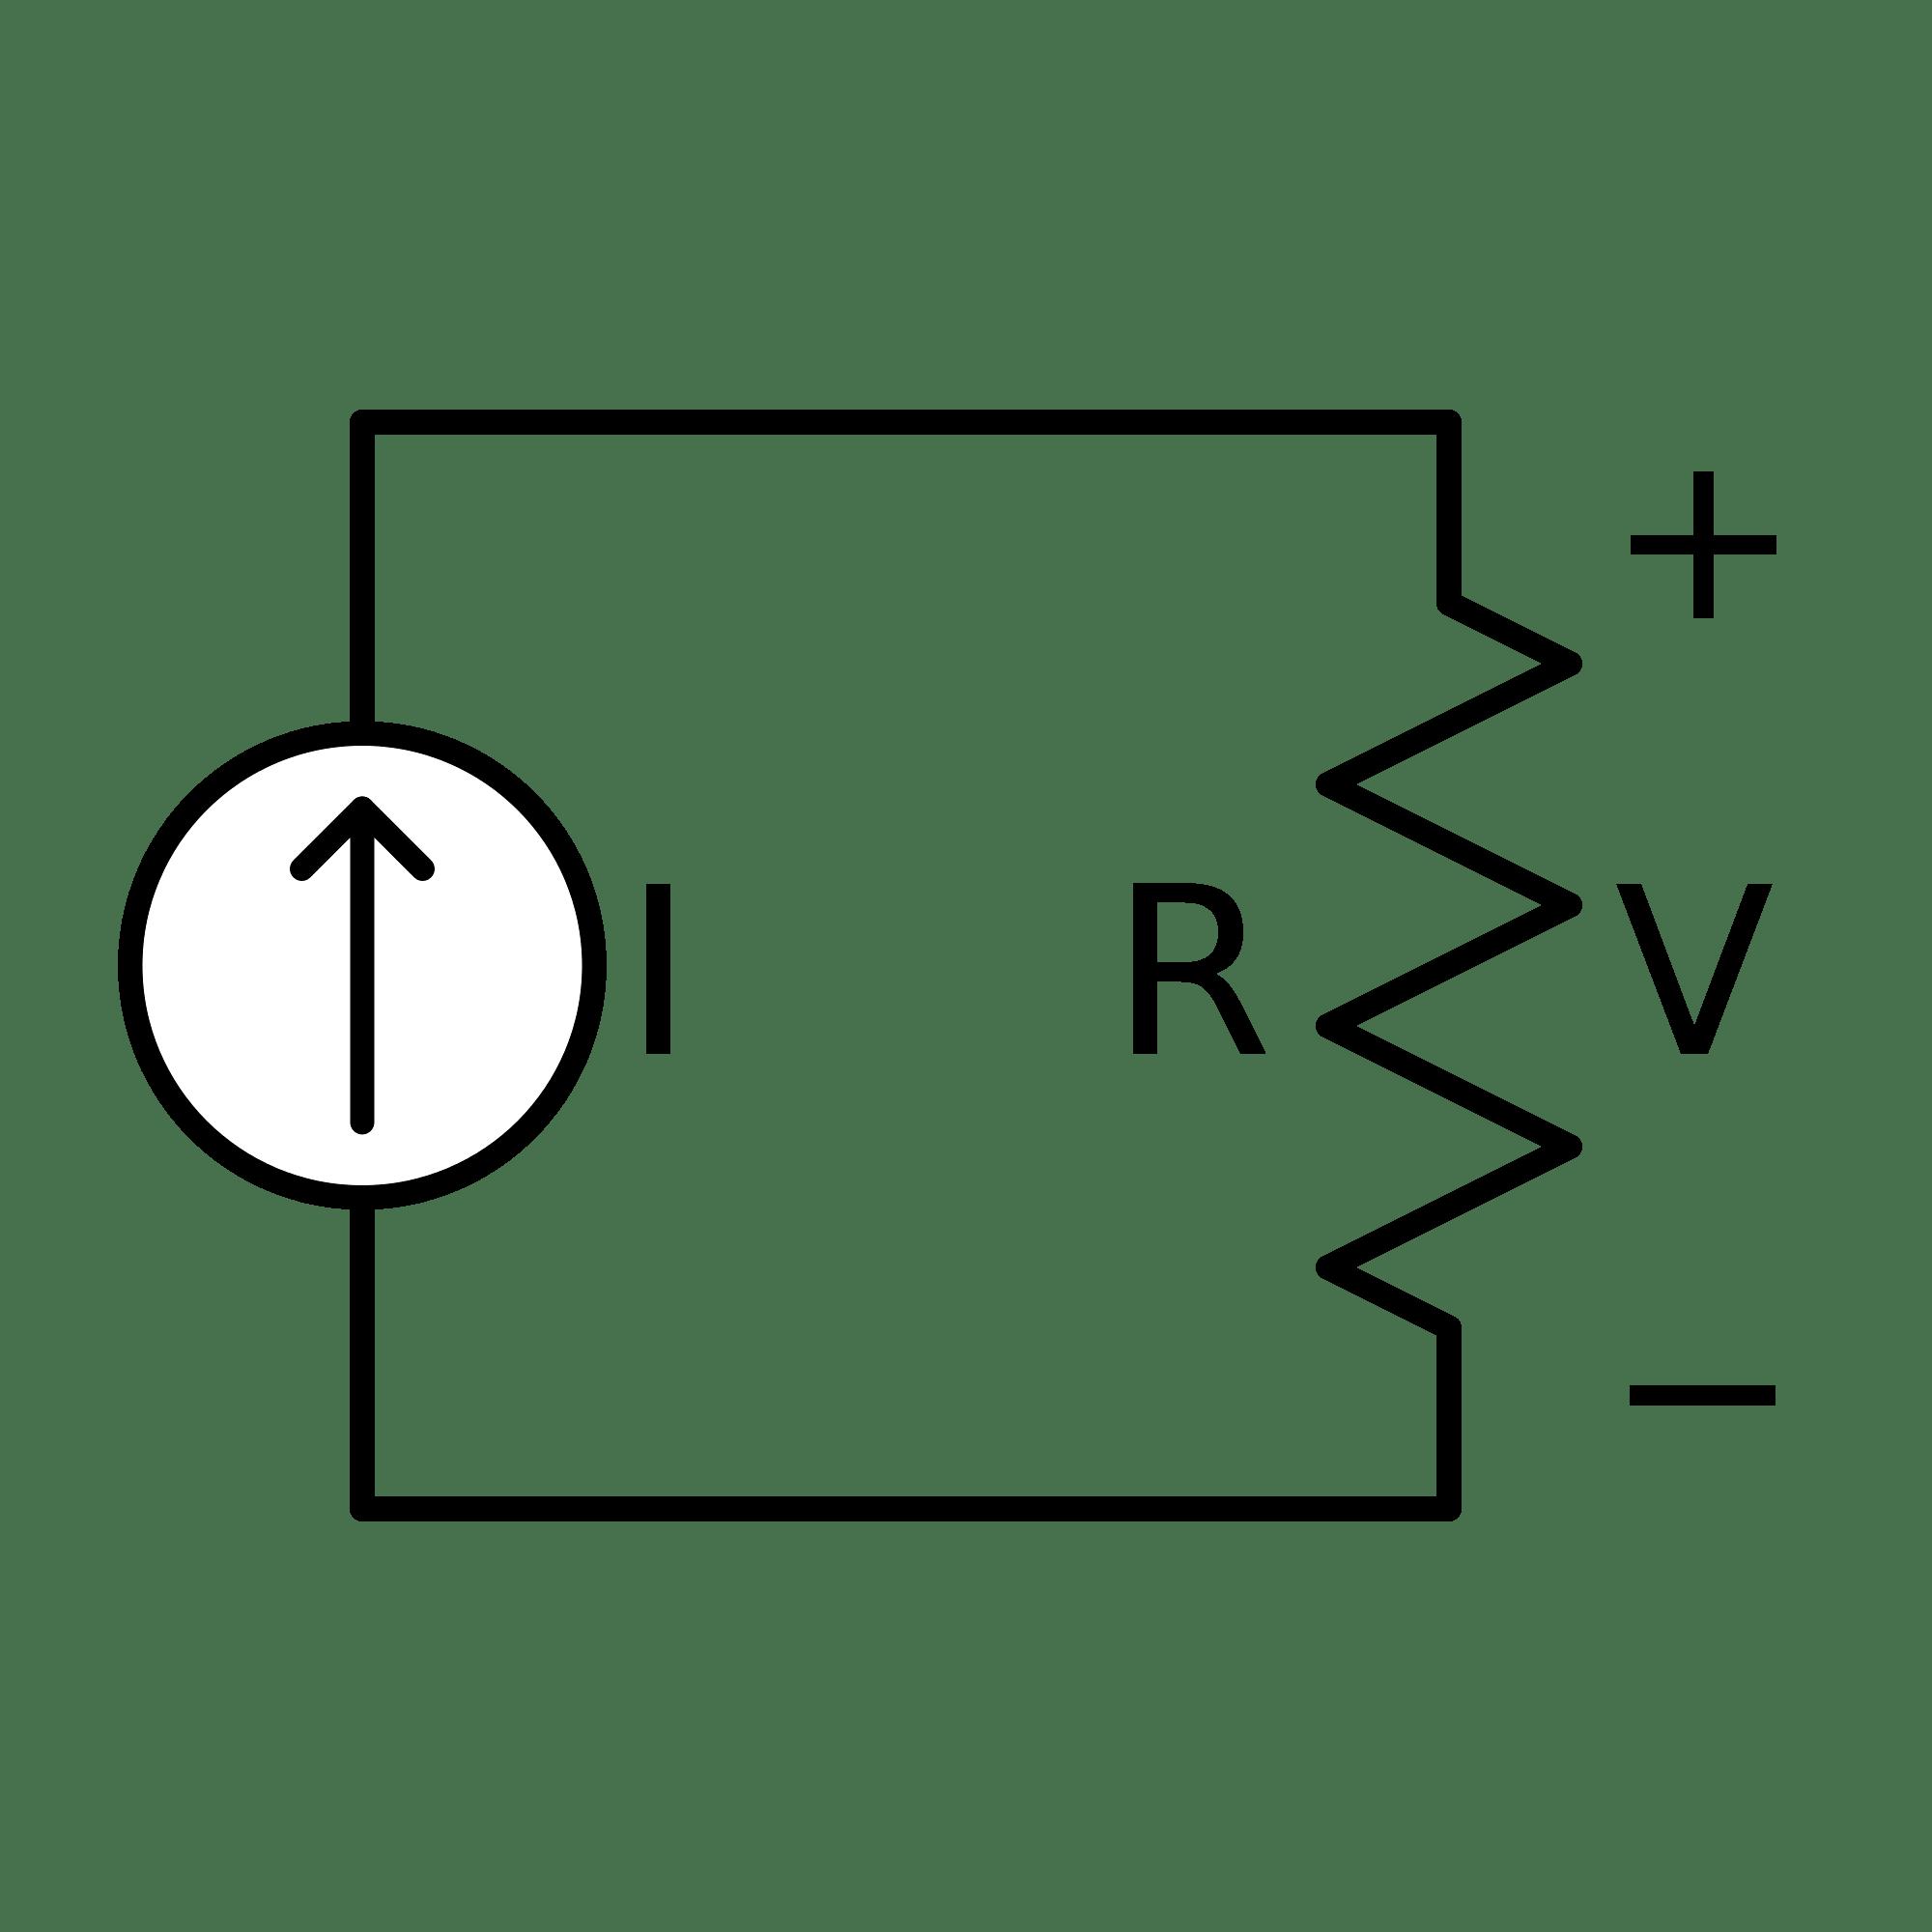 Symbol For Ac Power